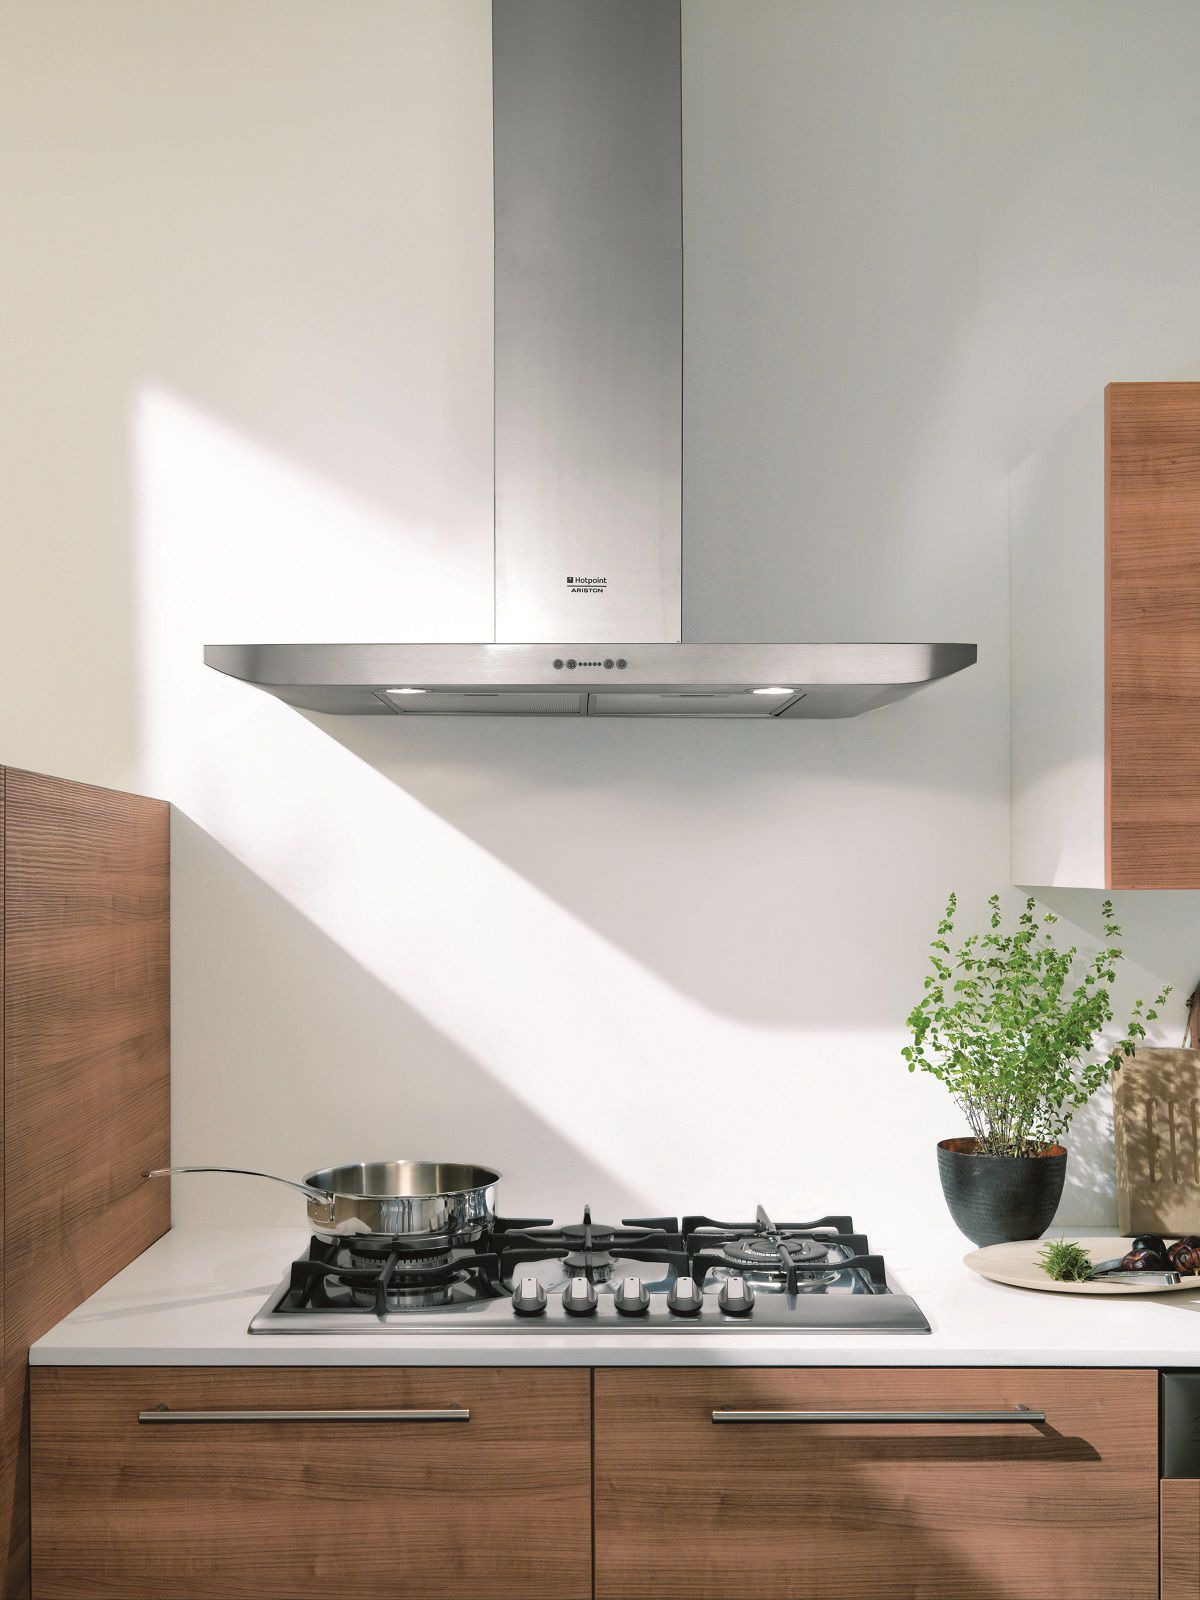 ariston kitchen appliances signature obicorp sdn bhd new ariston kitchen appliances   taste  rh   thetasteemaker com